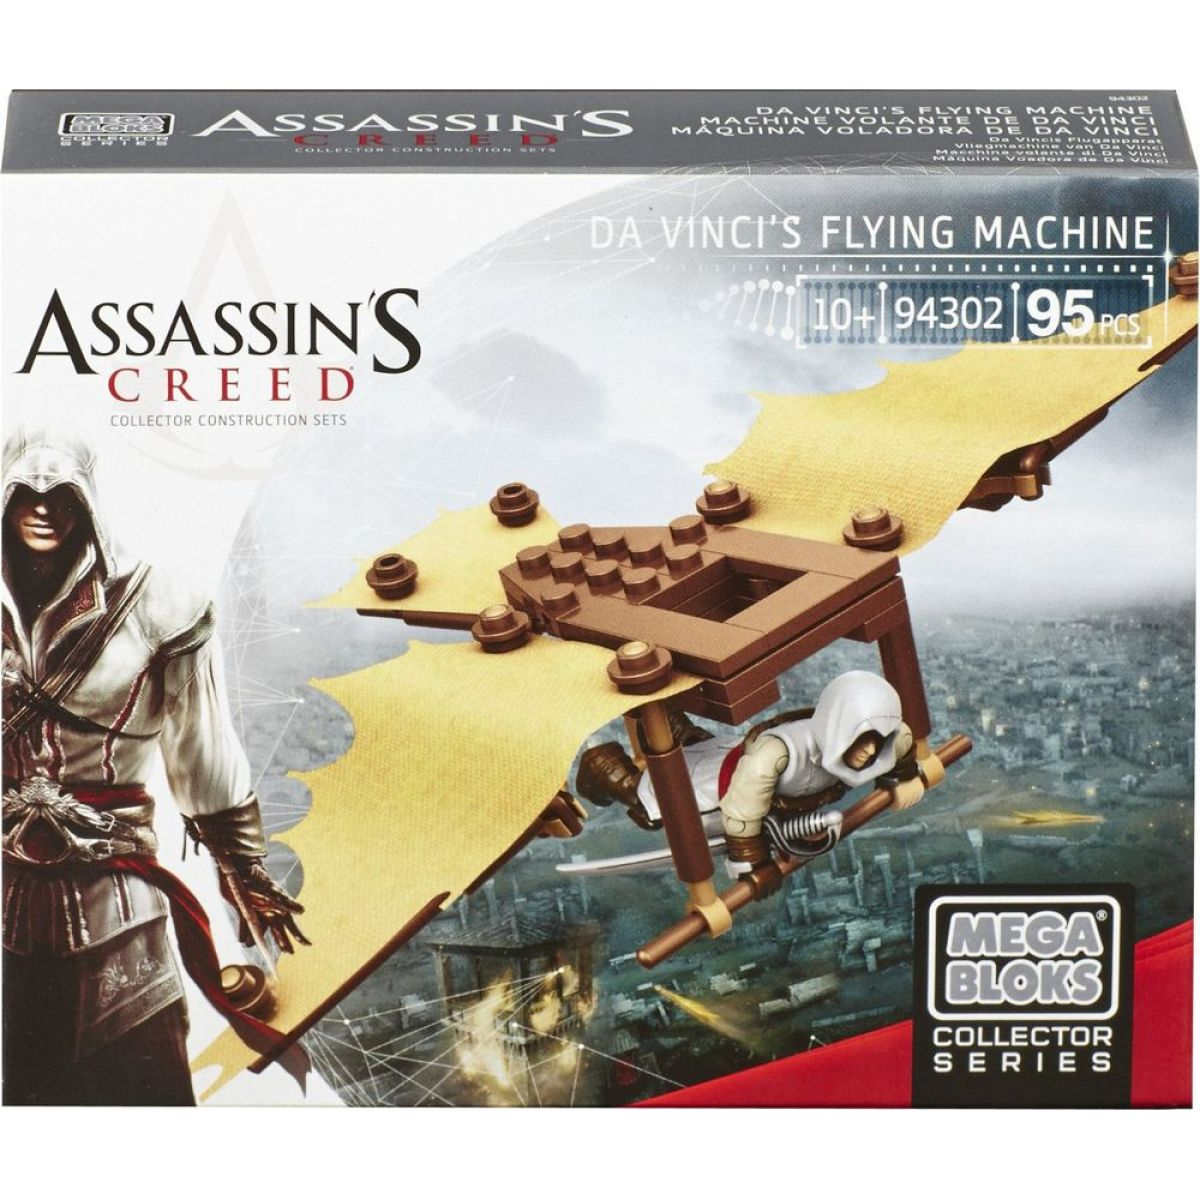 Megabloks Micro Assassin's Creed válečný stroj - Da Vinci's Flying Machine